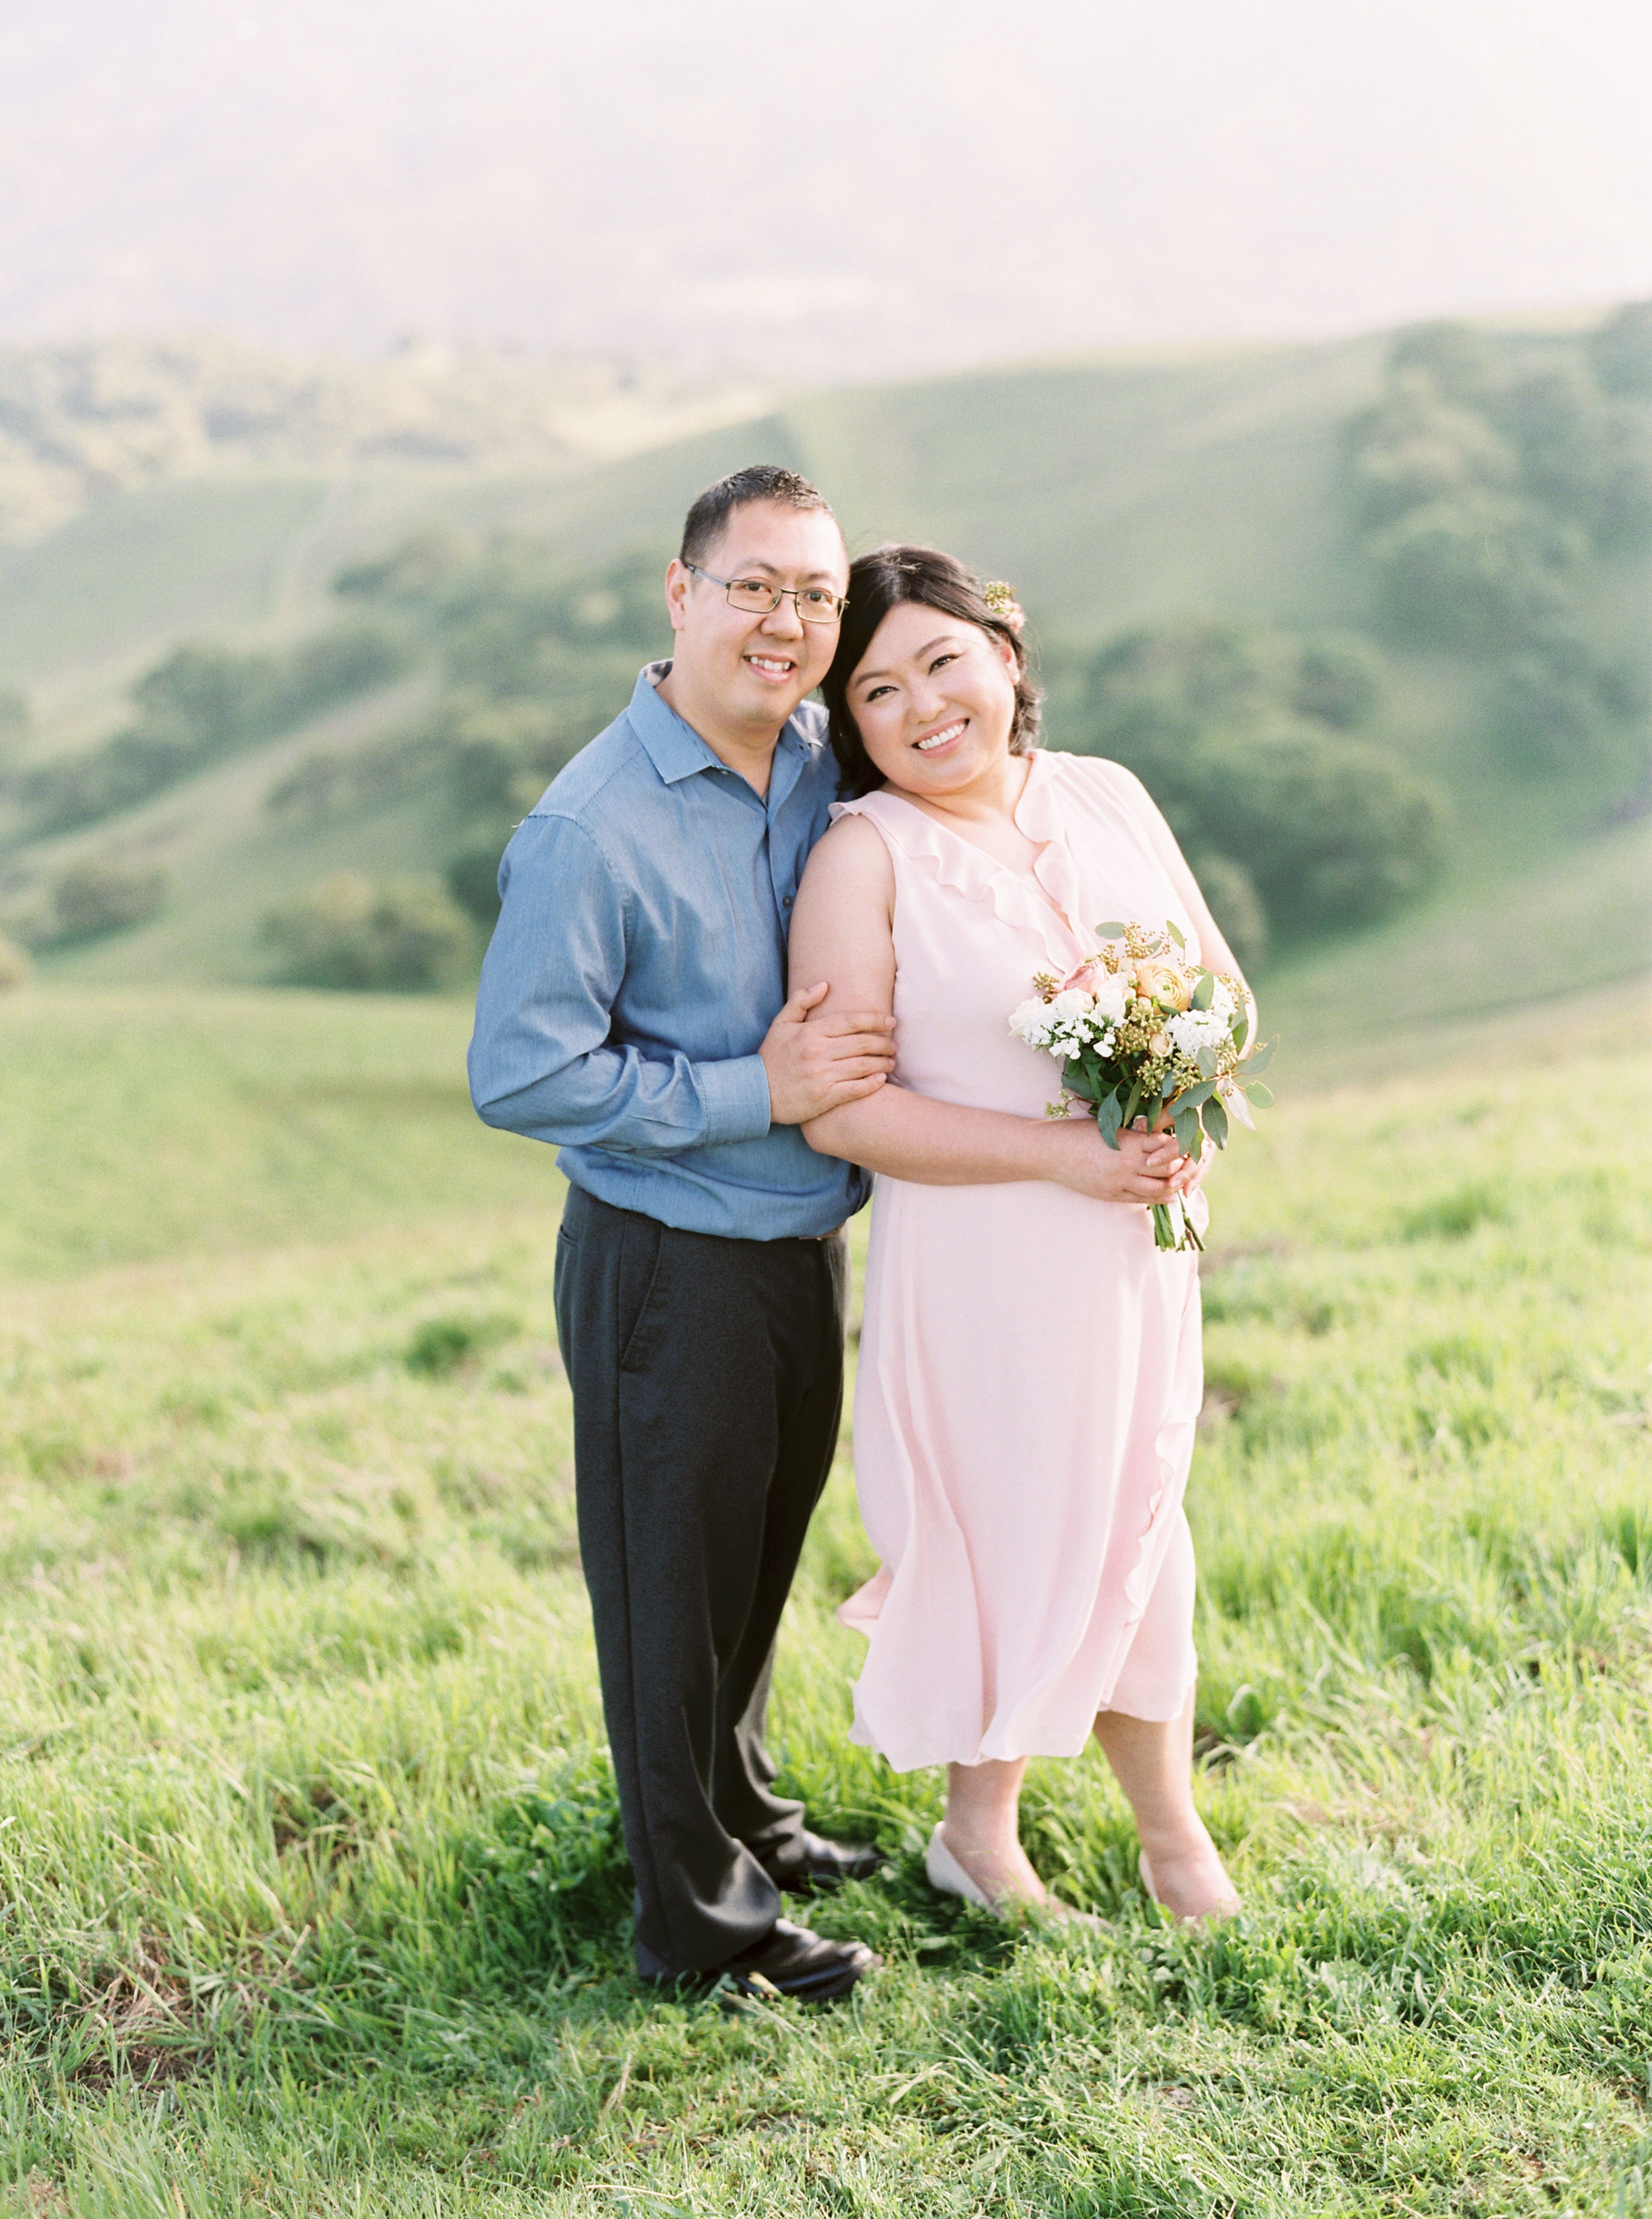 del-valle-livermore-bay-area-wedding-photographer-54.jpg